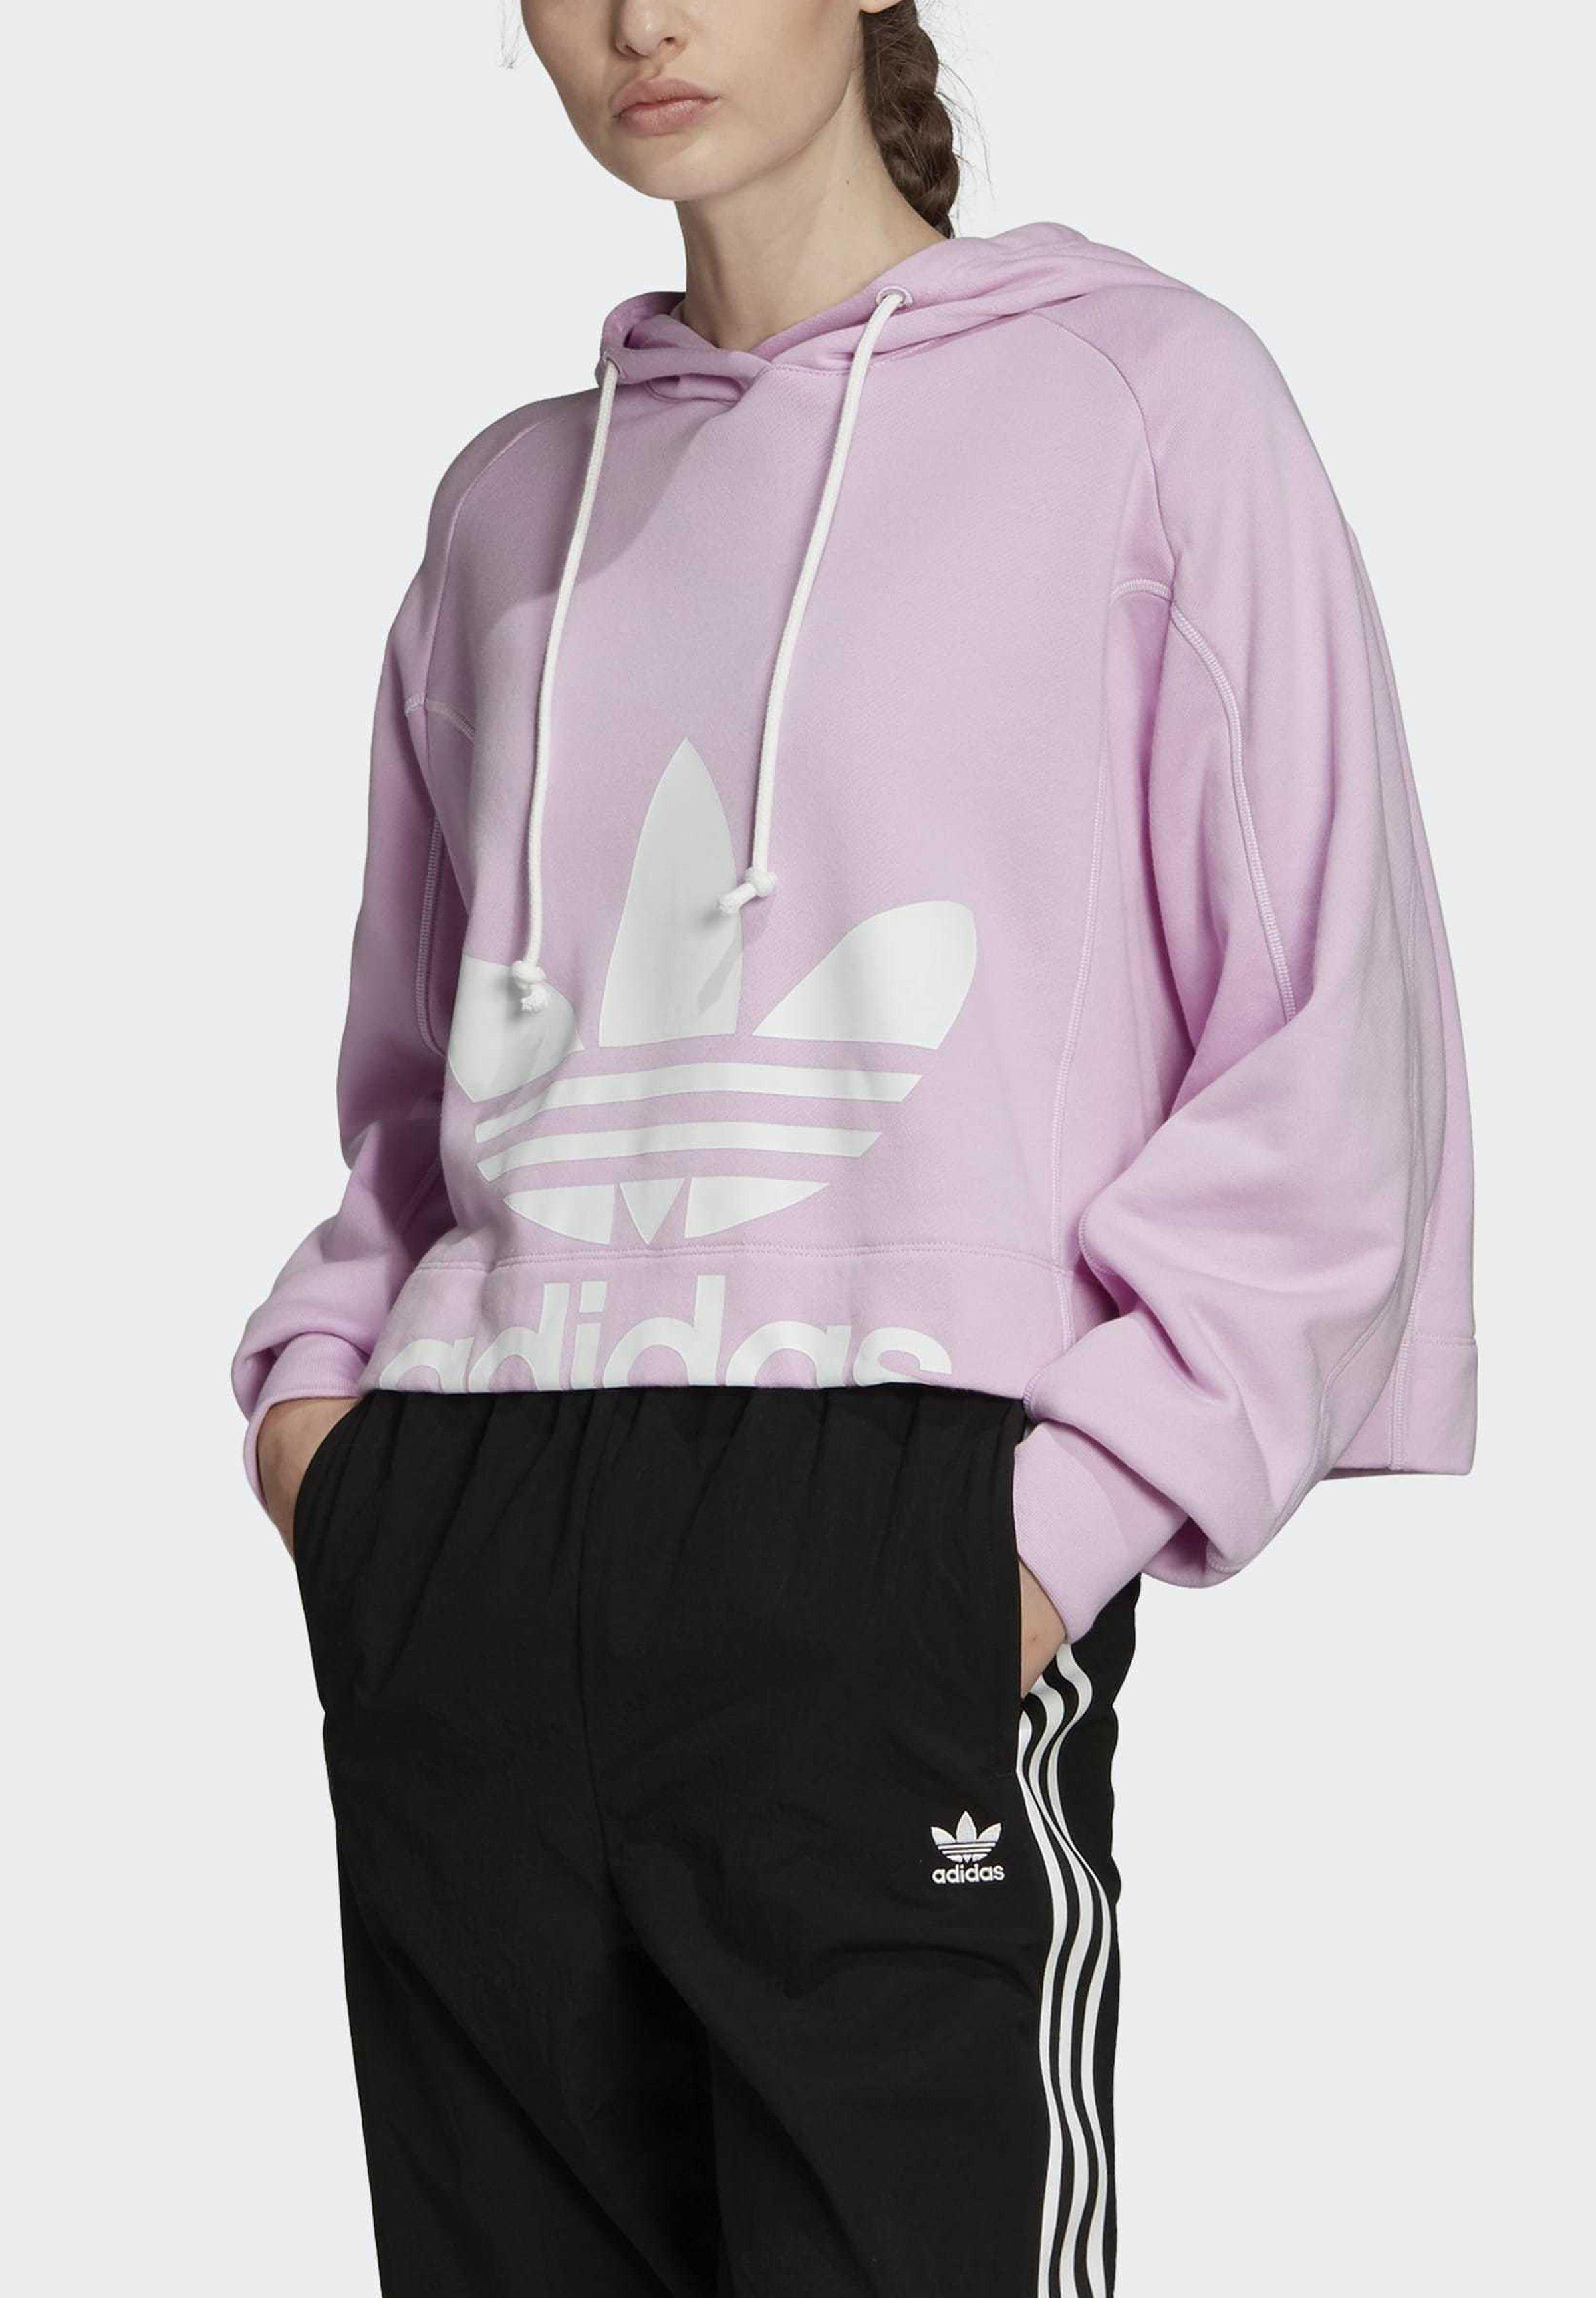 adidas Originals CROPPED HOODIE - Sweat à capuche - purple - Pulls & Gilets Femme O7SDn